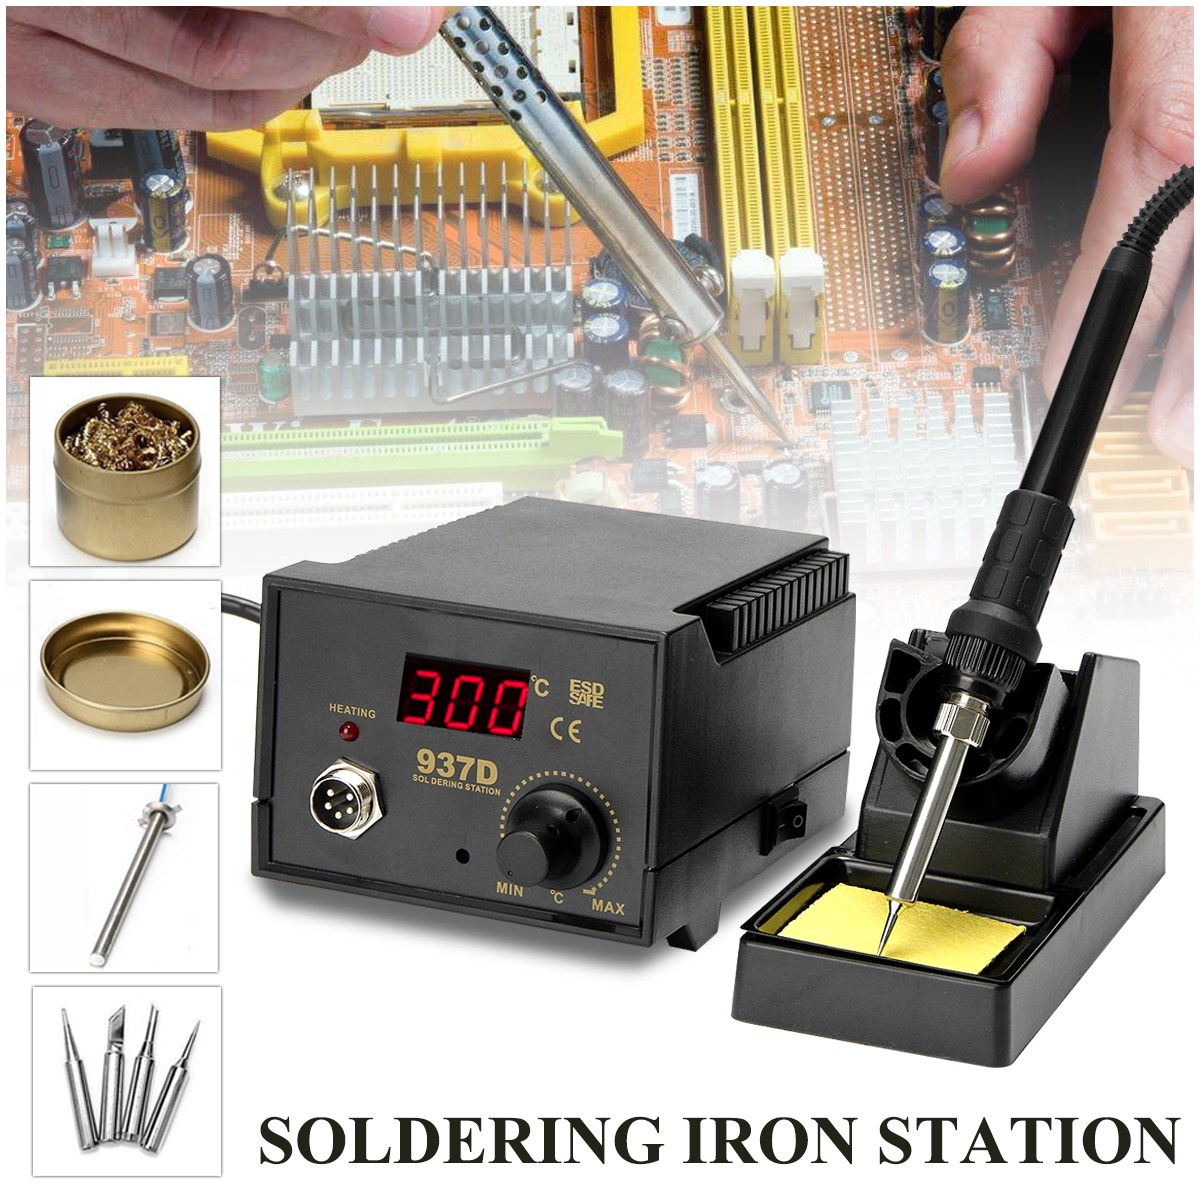 High quality 937D 220V 75W Digital Display Soldering Iron Station 4 Tip Lead Welding Tool Kit цена